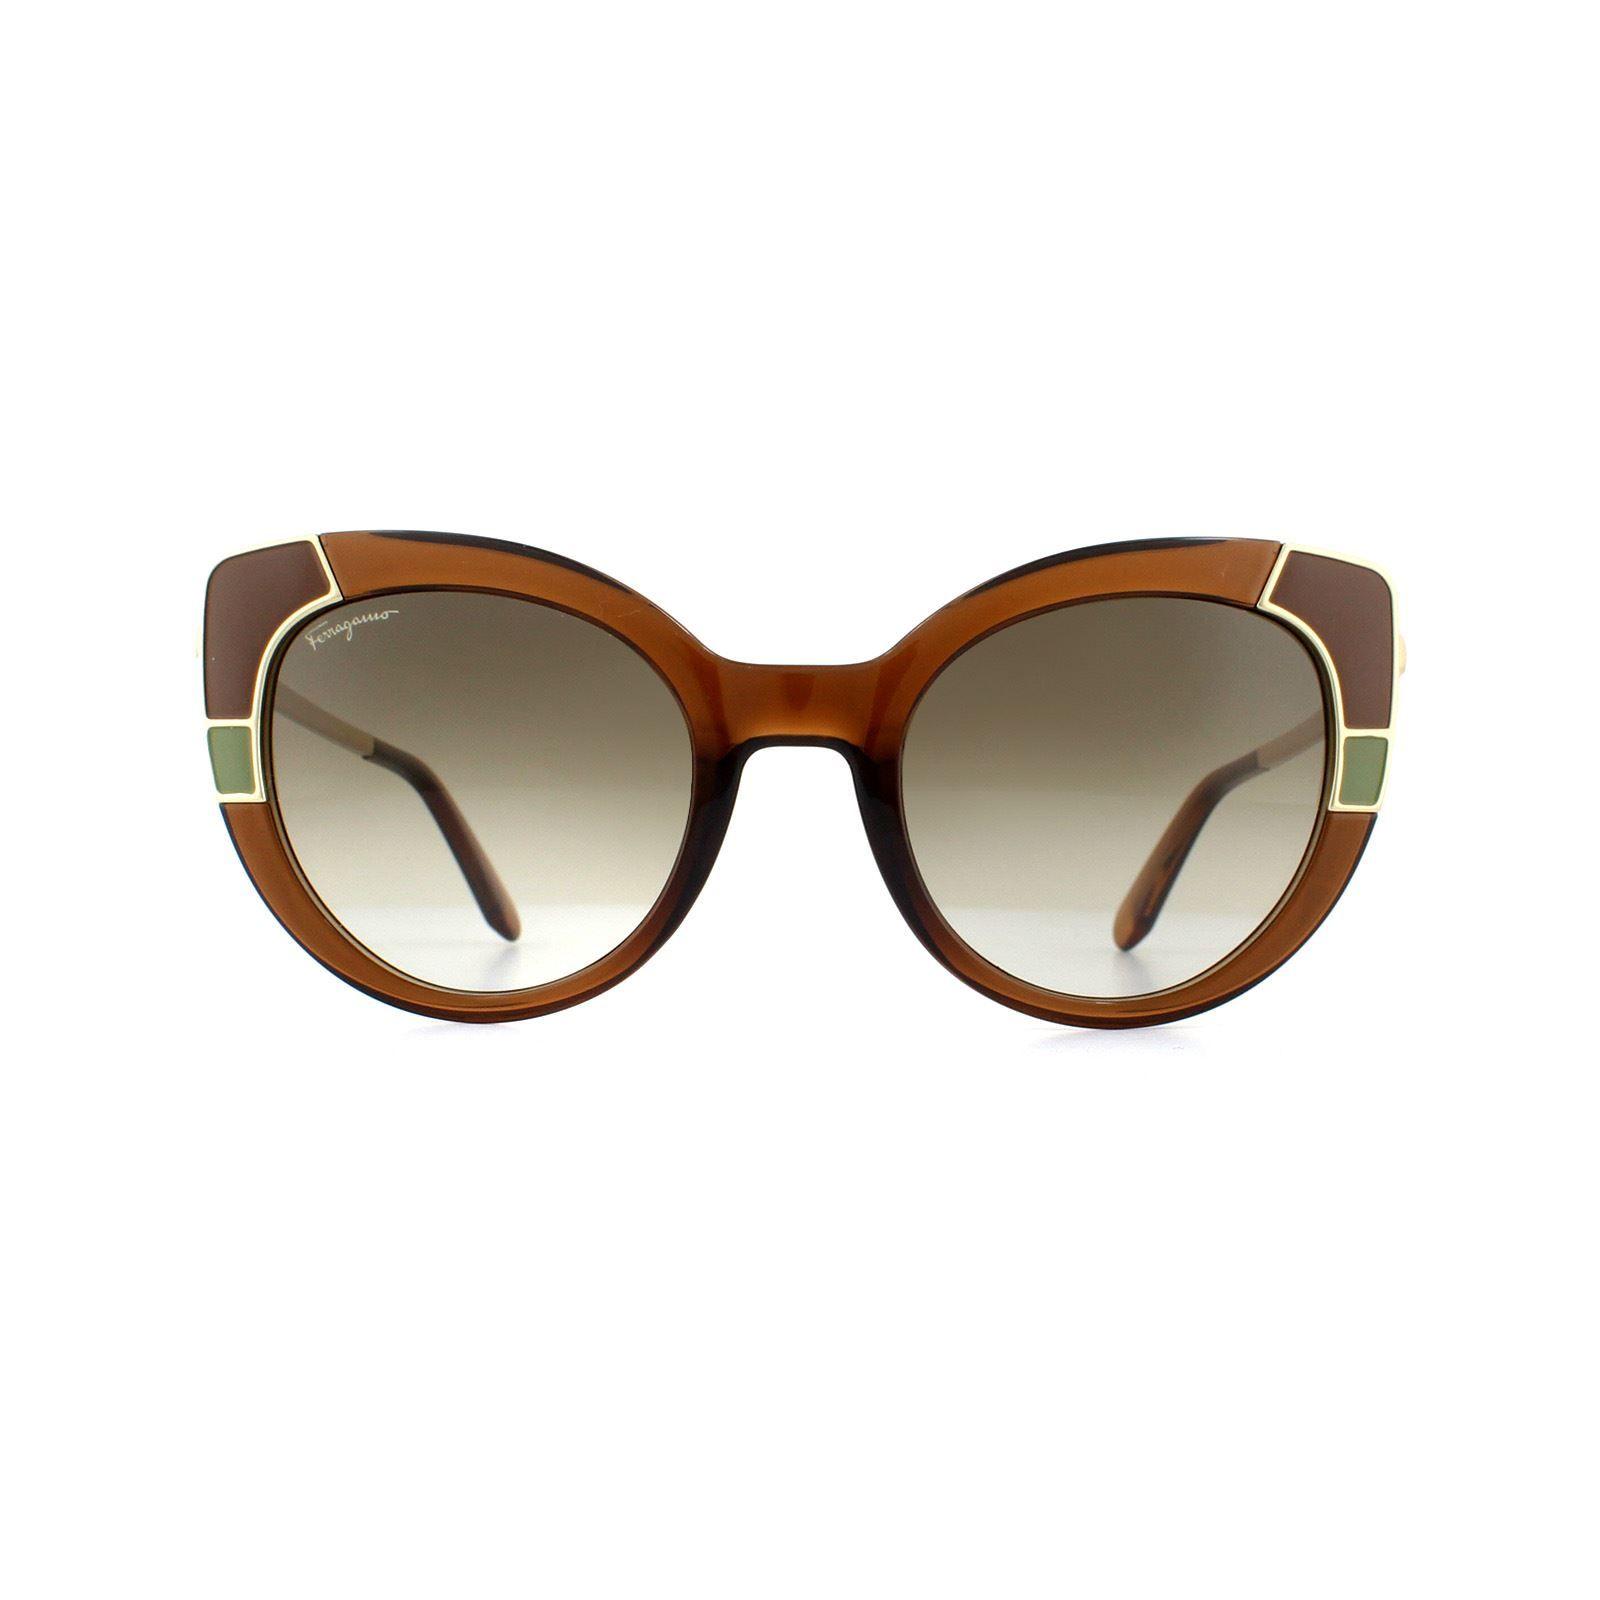 Salvatore Ferragamo Sunglasses SF890S 210 Crystal Brown Grey Gradient